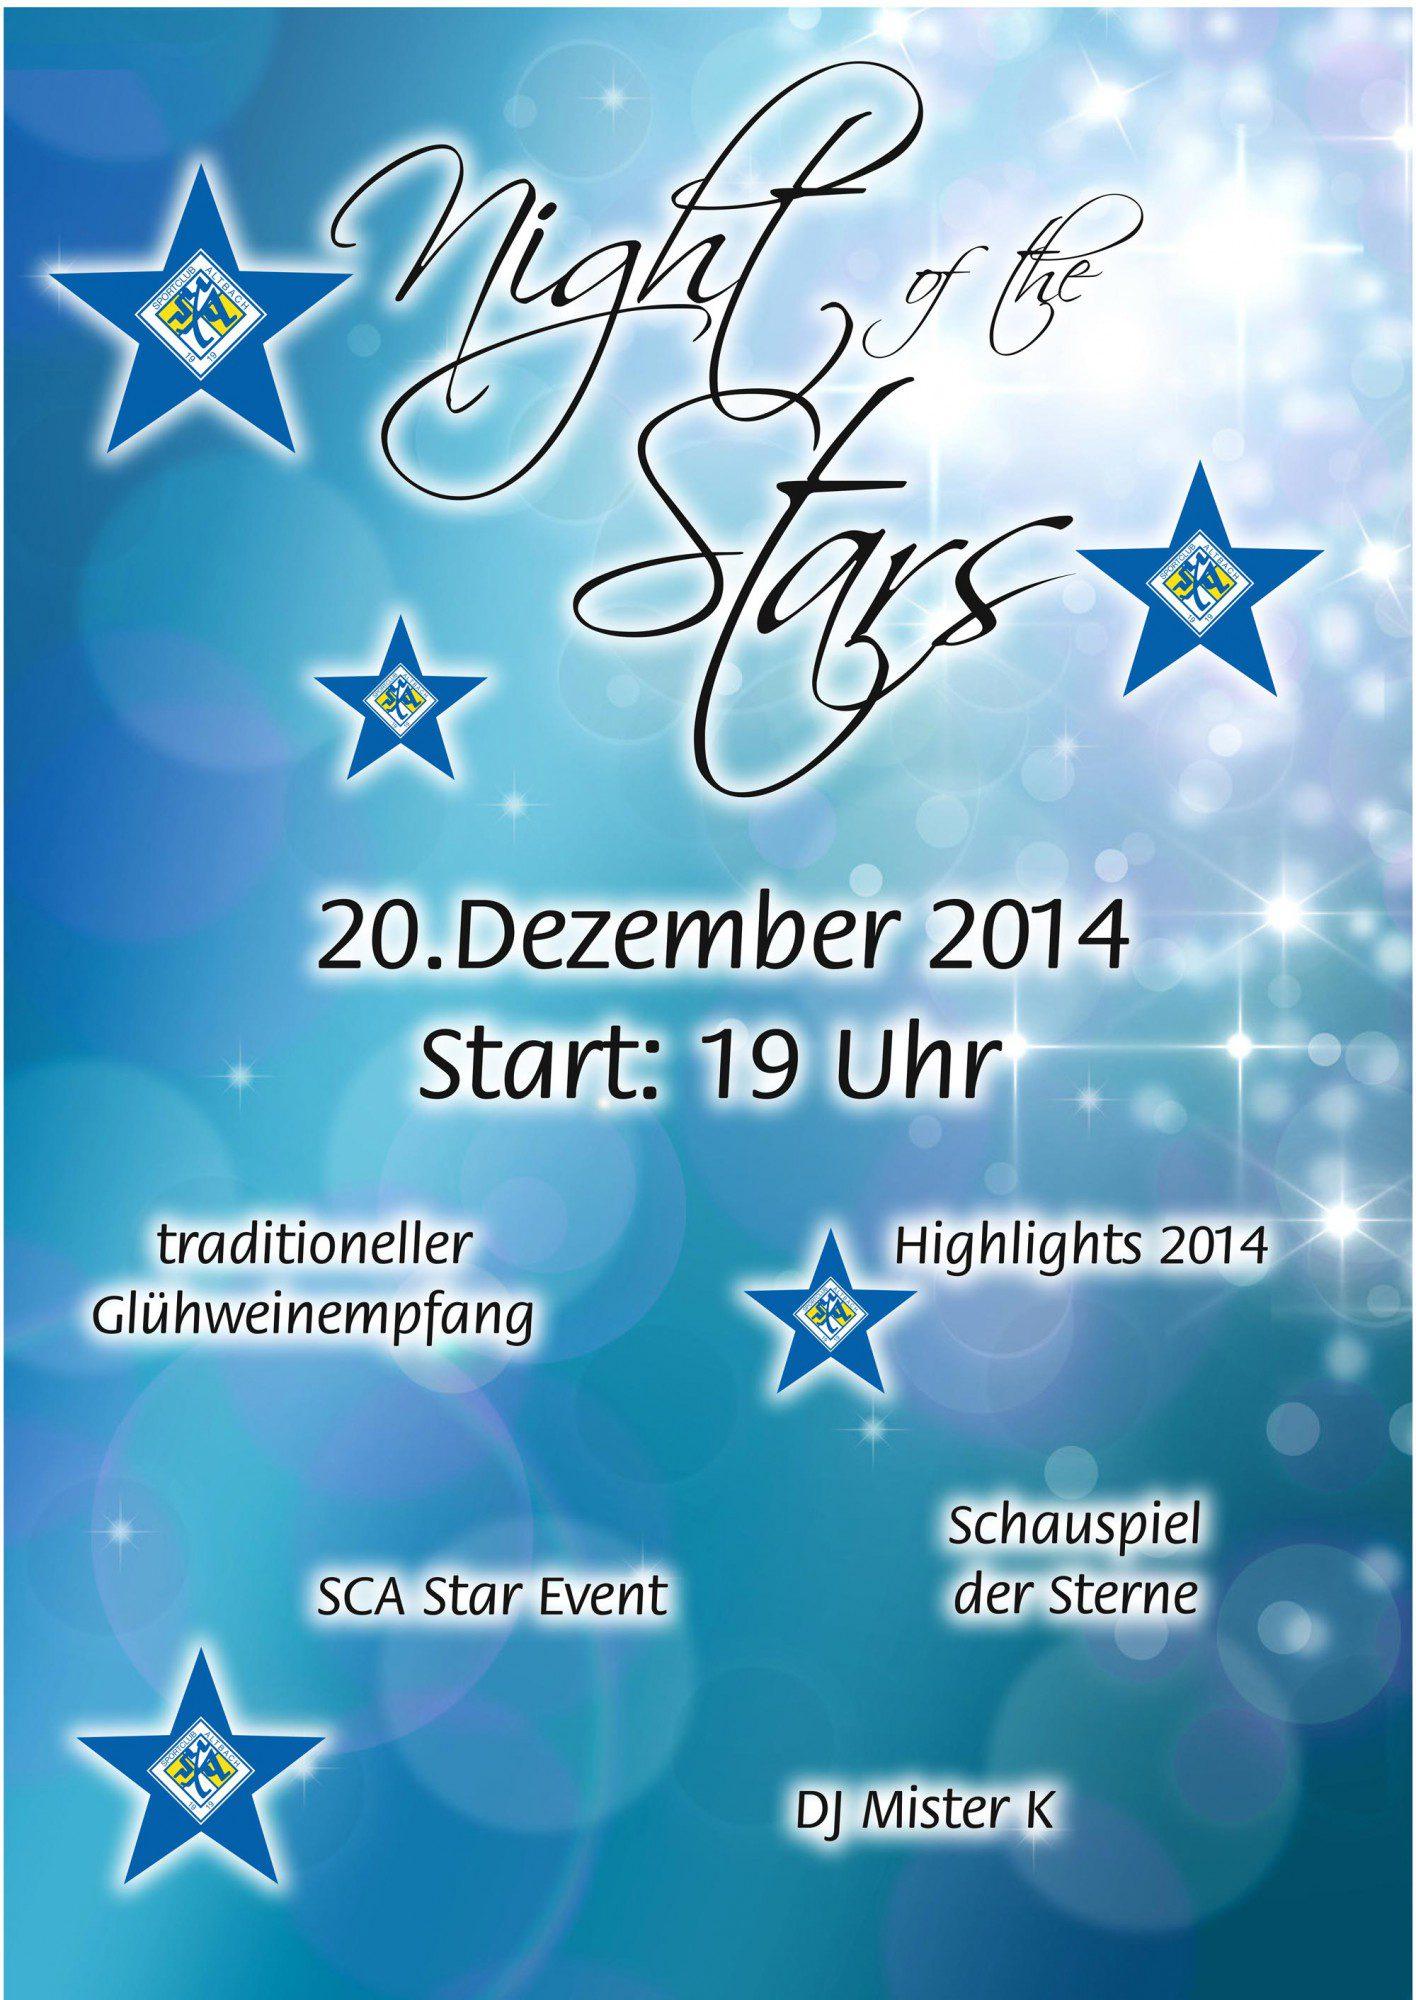 Plakat_Weihnachtsfeier_A1